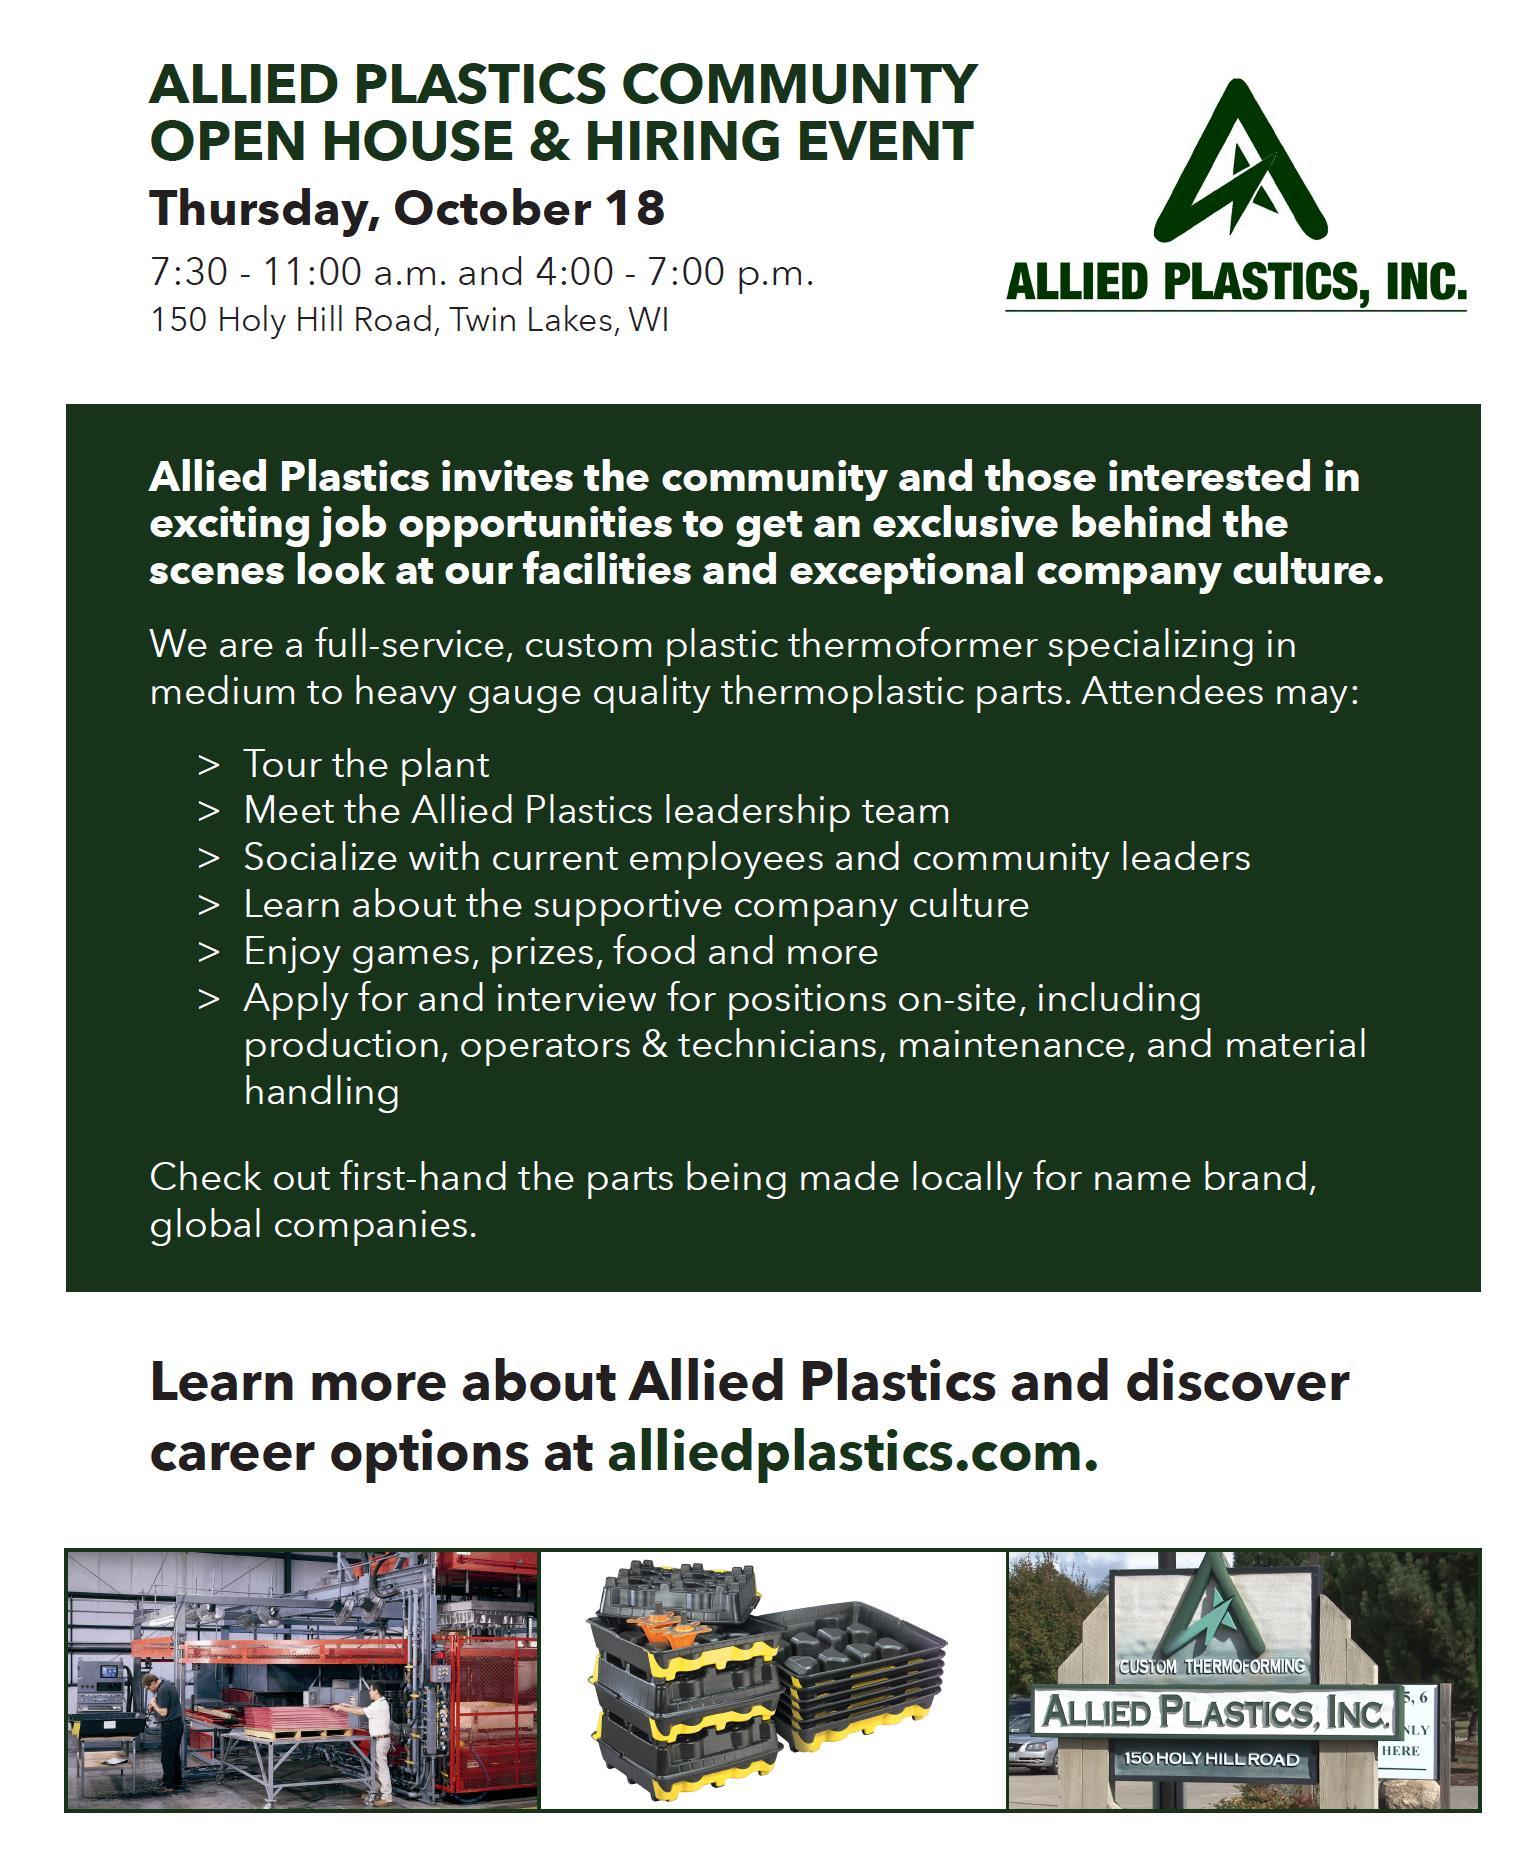 Thermoforming Plastic Manufacturing Careers – Allied Plastics